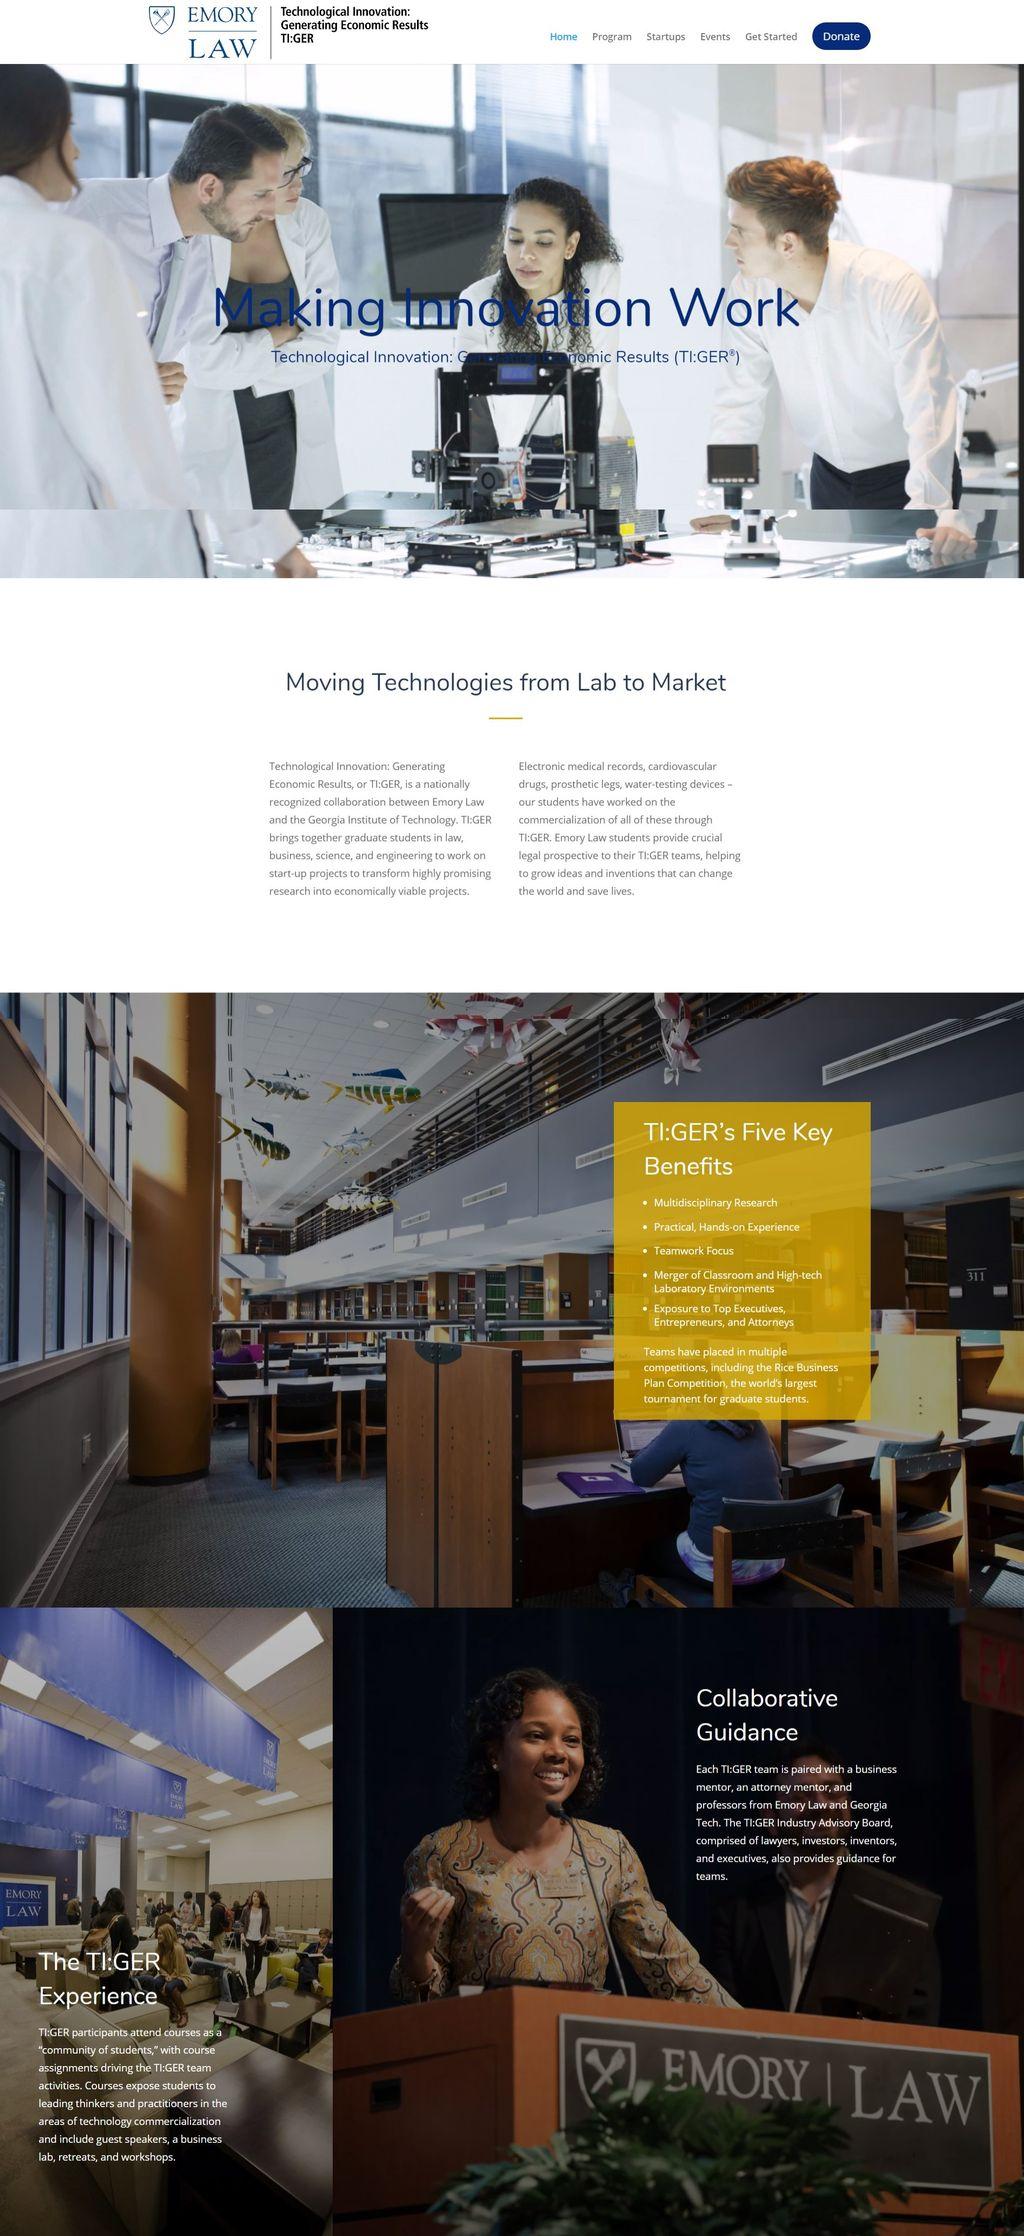 Emory University School of Law TIGER Program